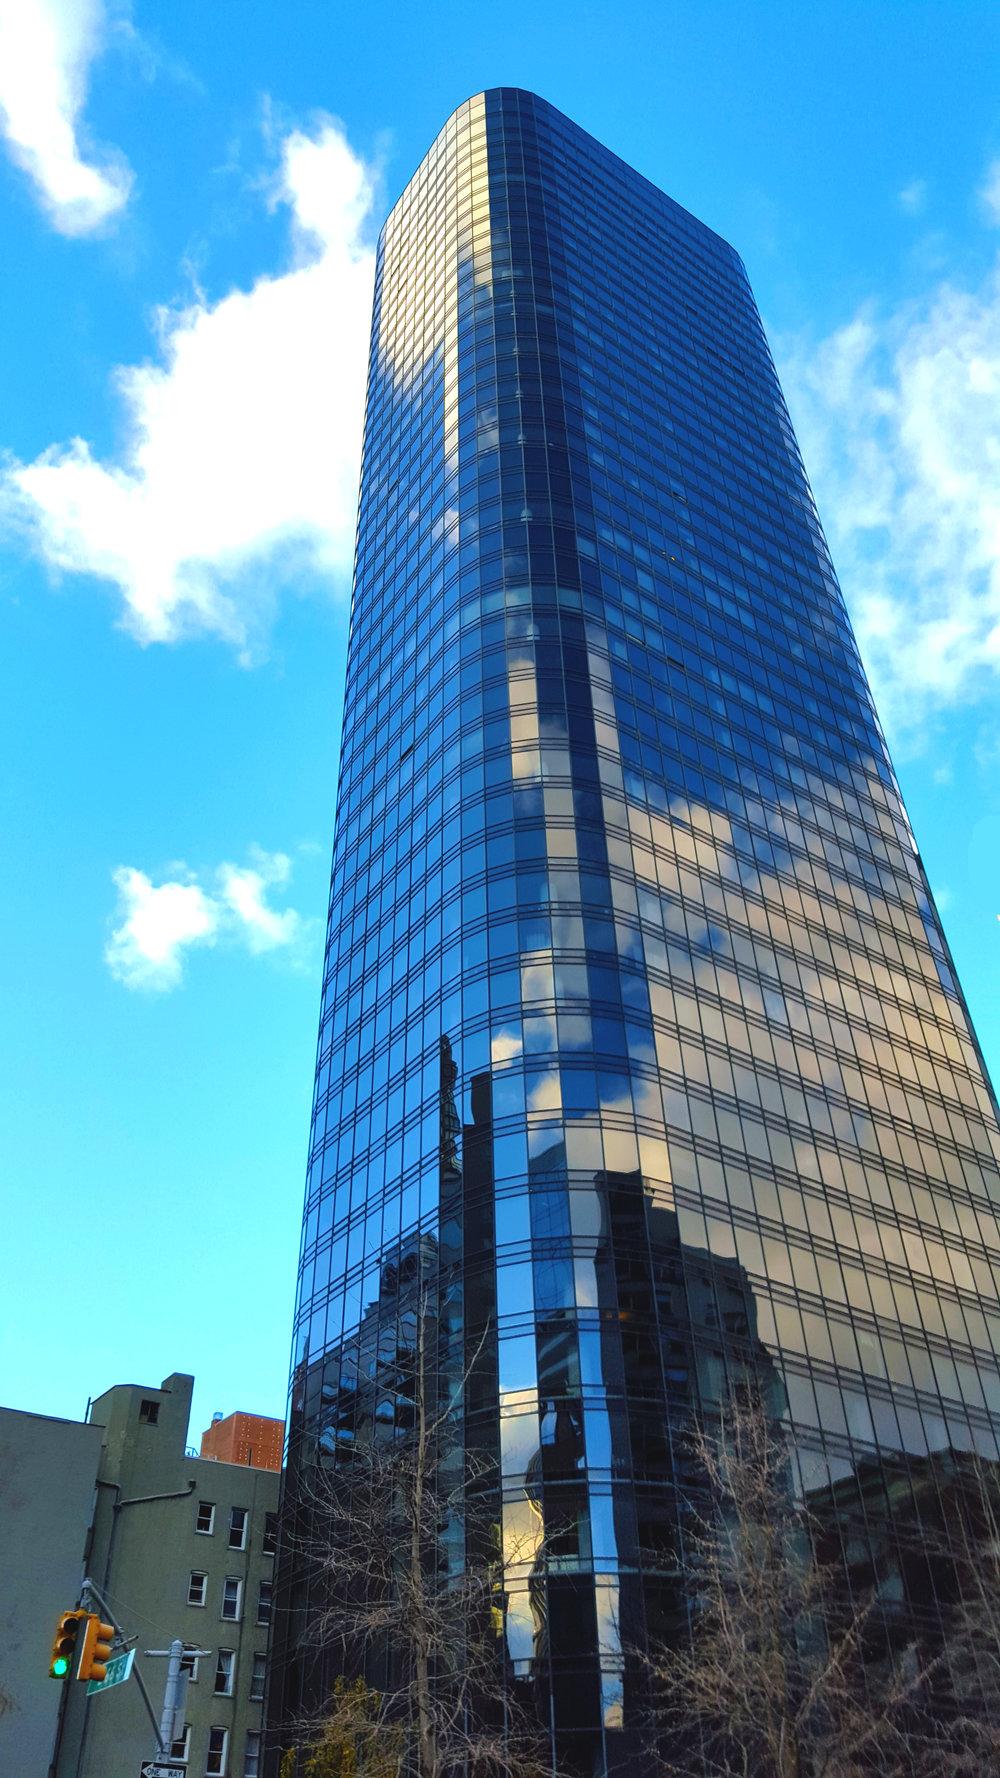 Skyscrapers 5.jpg